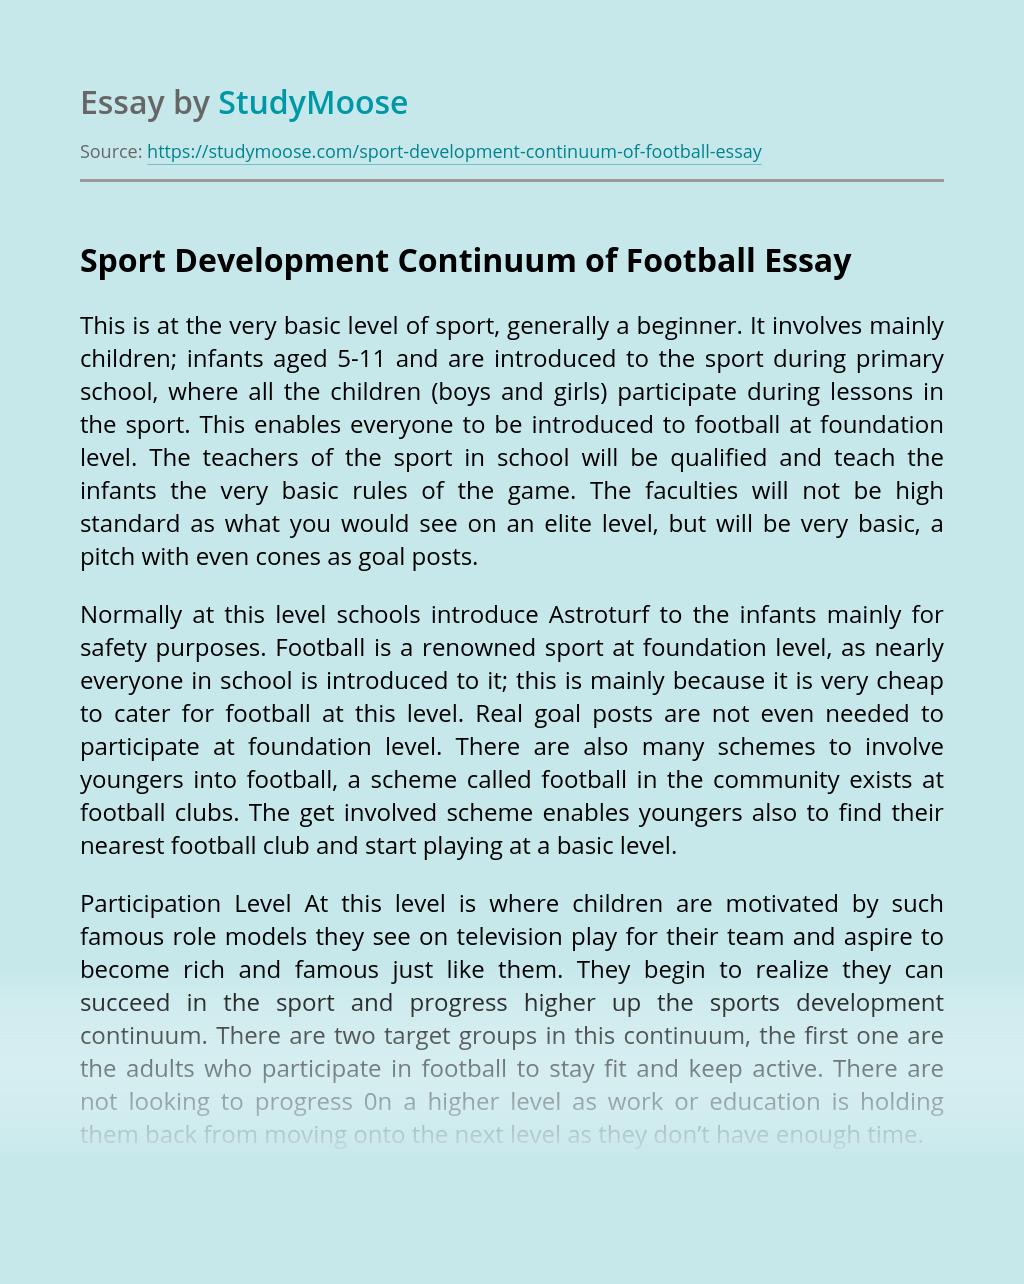 Sport Development Continuum of Football